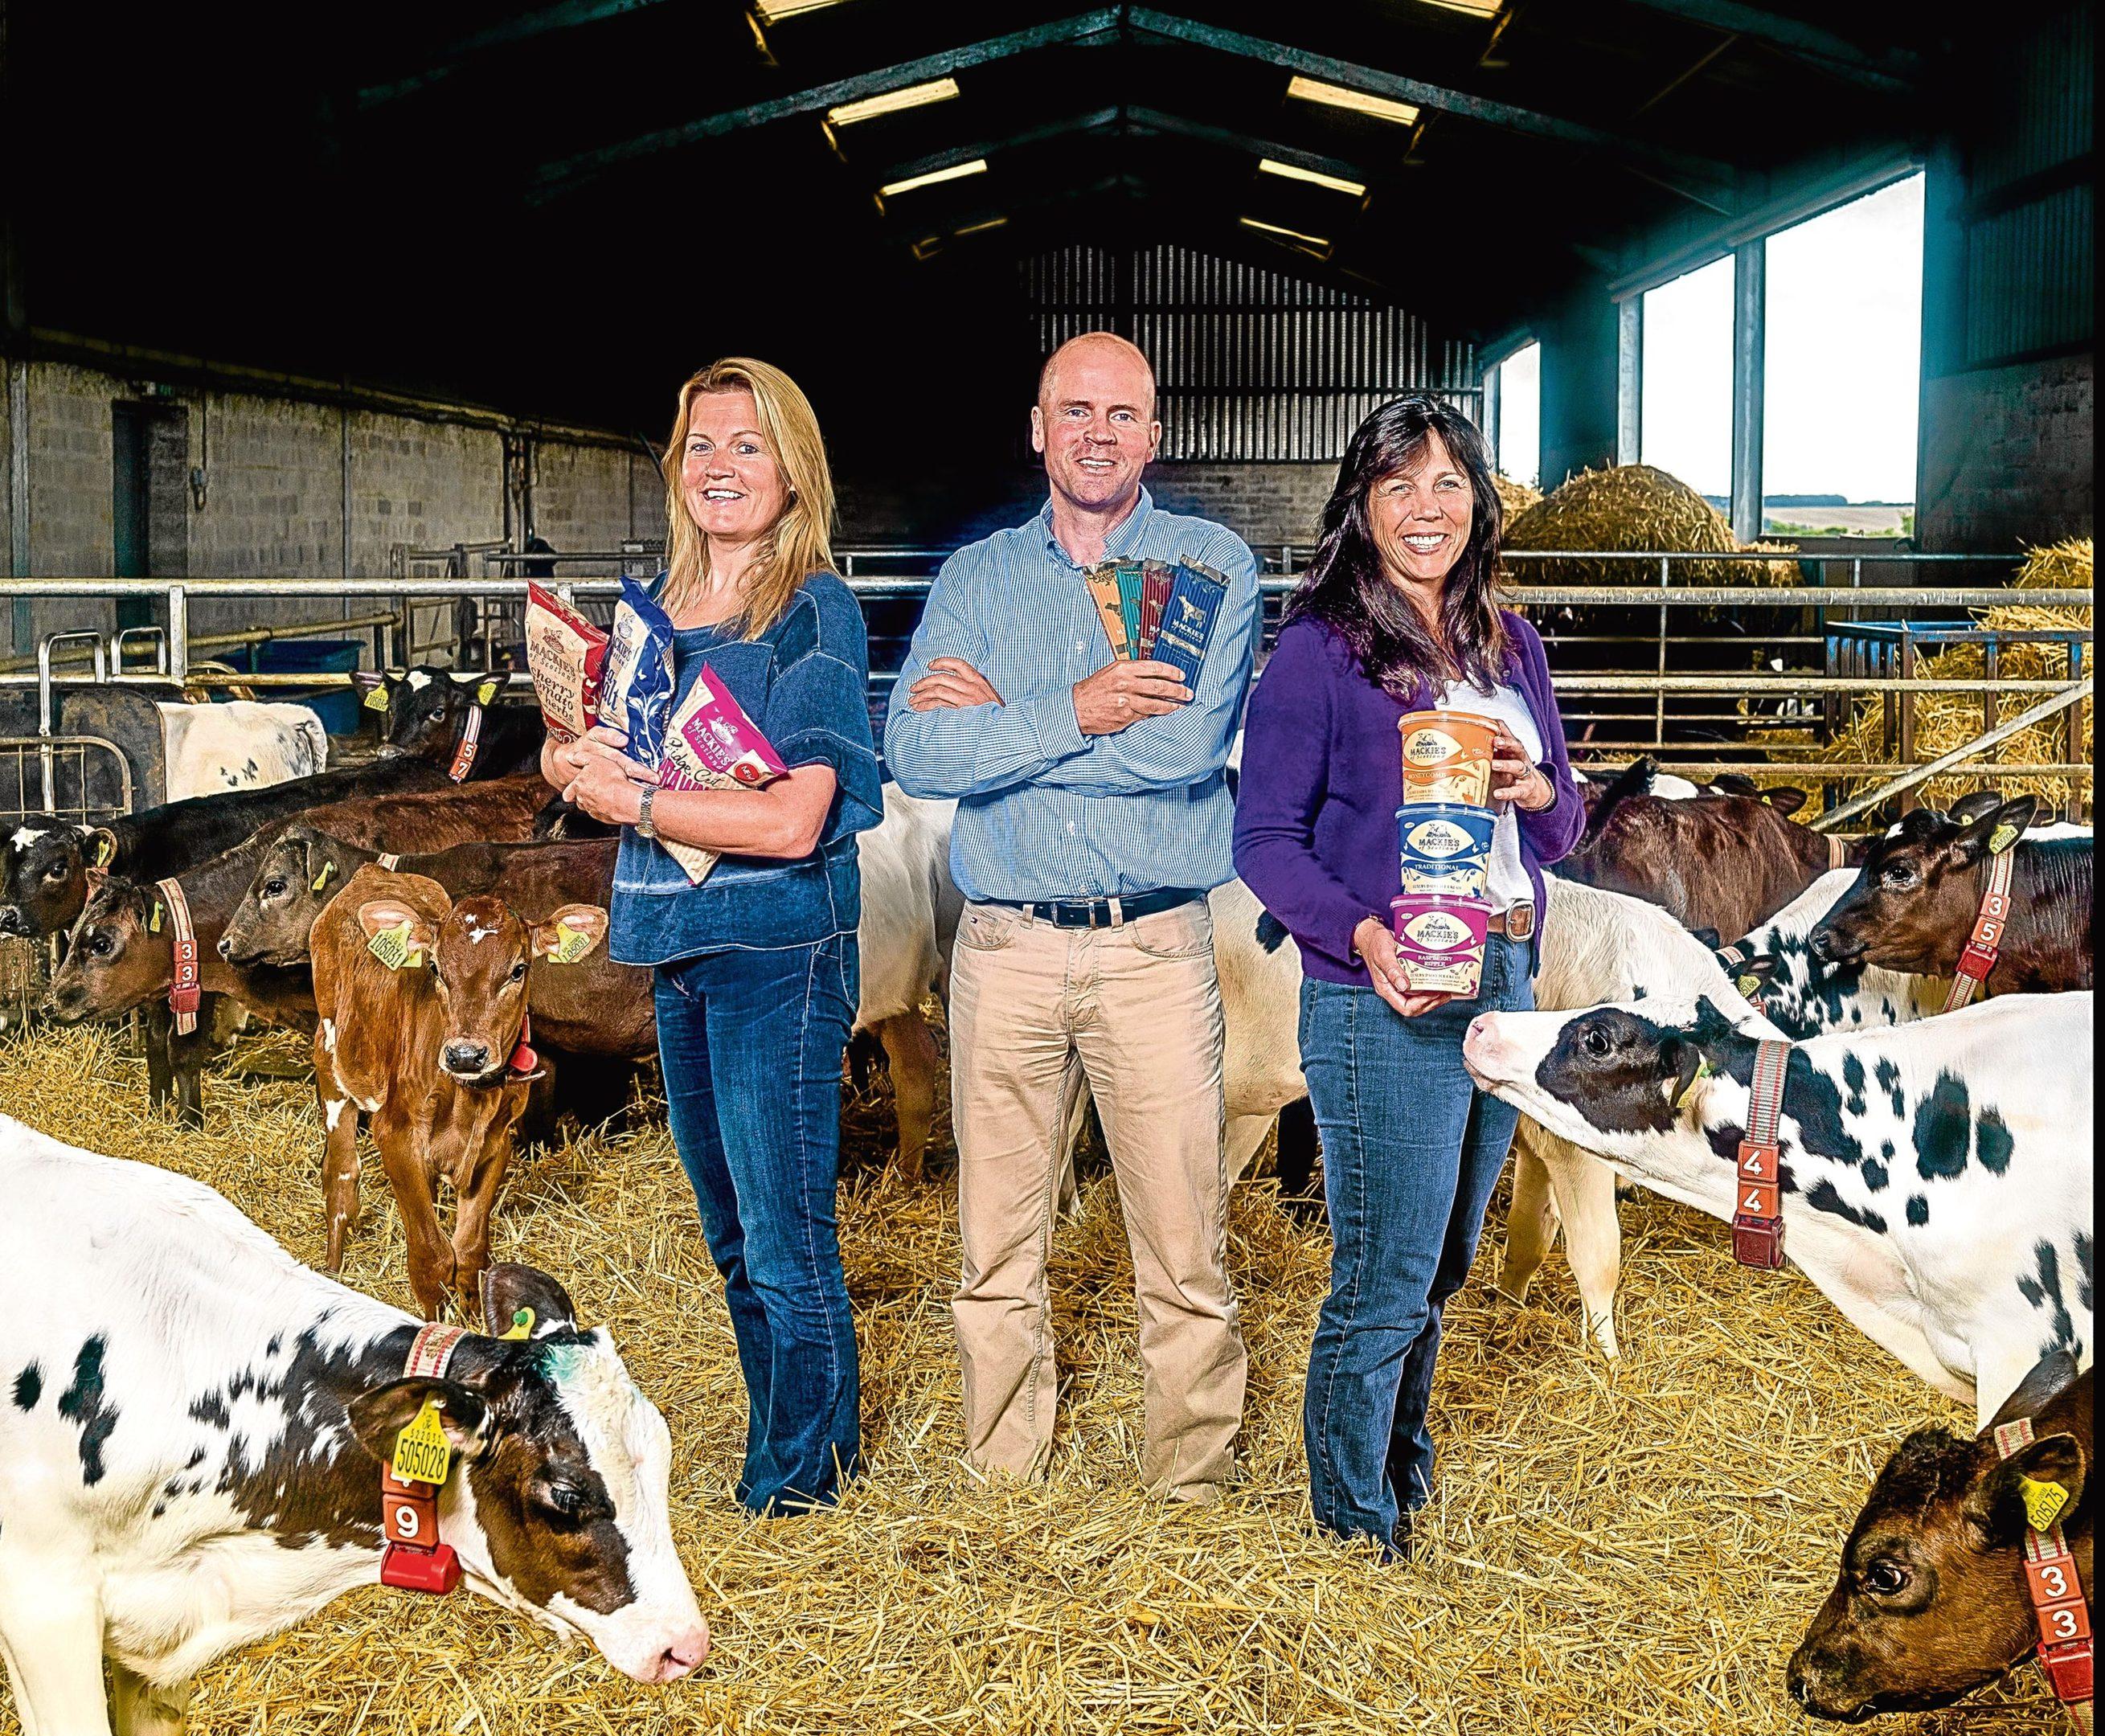 left to right Kirstin Mackie, Mac Mackie and Karin Hayhow